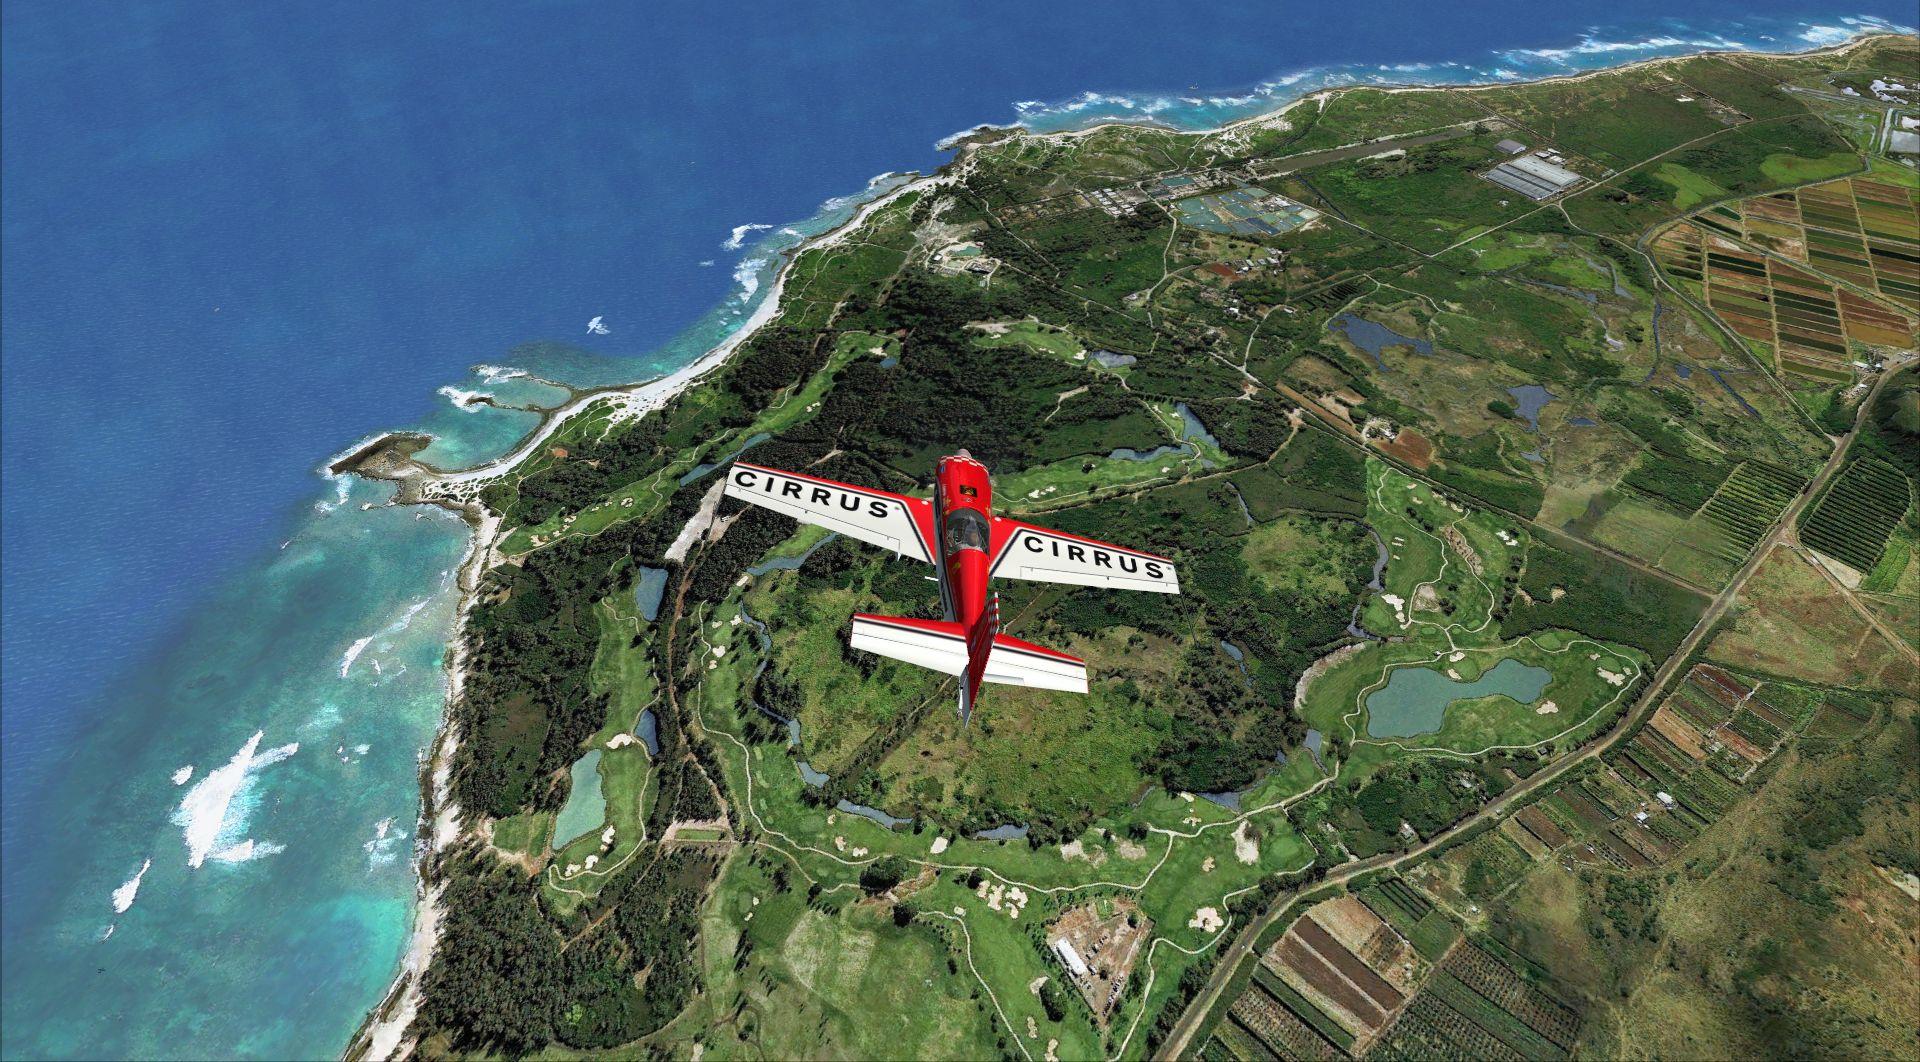 2001_hawaii19_2020-1-wqkqv.jpg